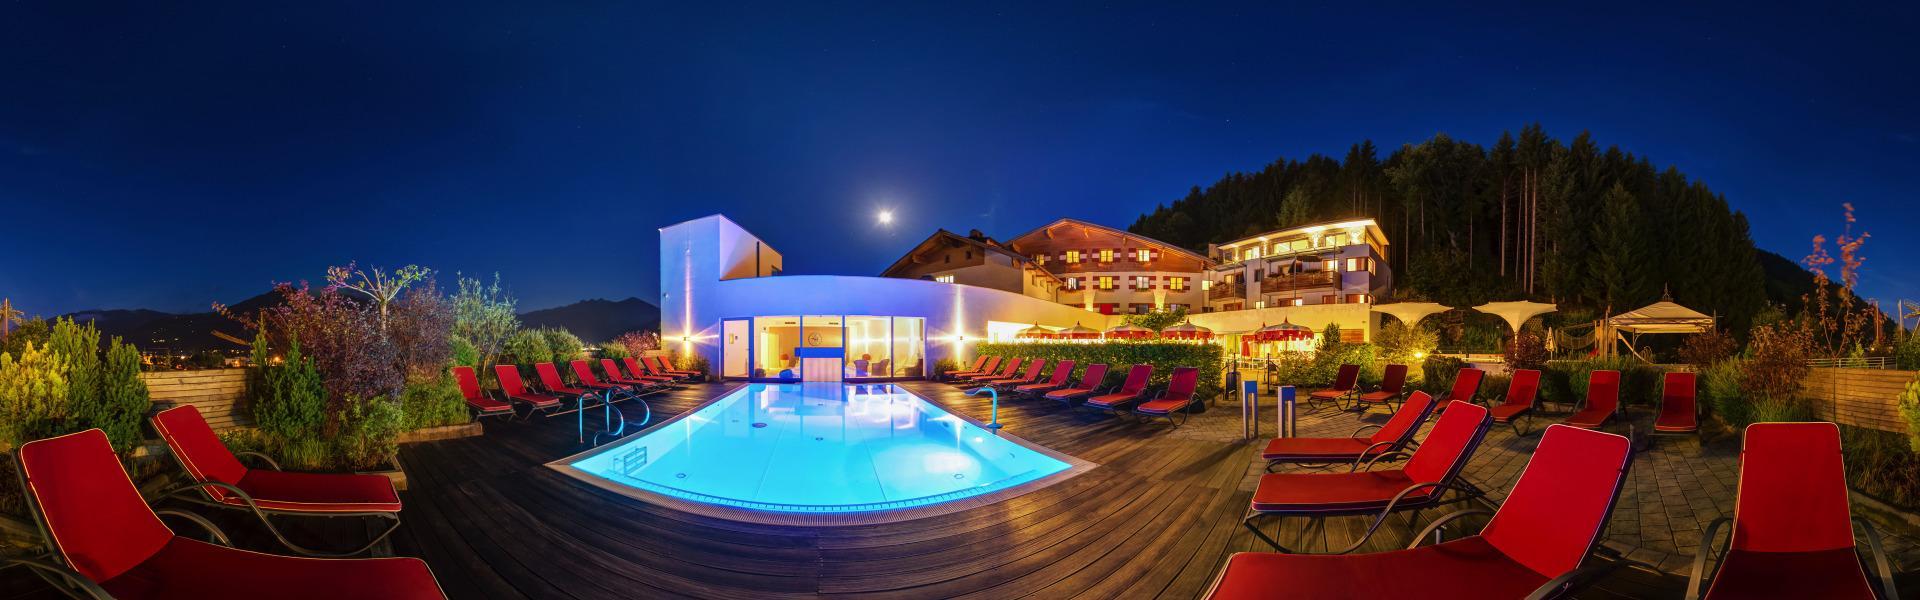 1. Boutiquehotel für Familien > amiamo - Familotel Zell am See